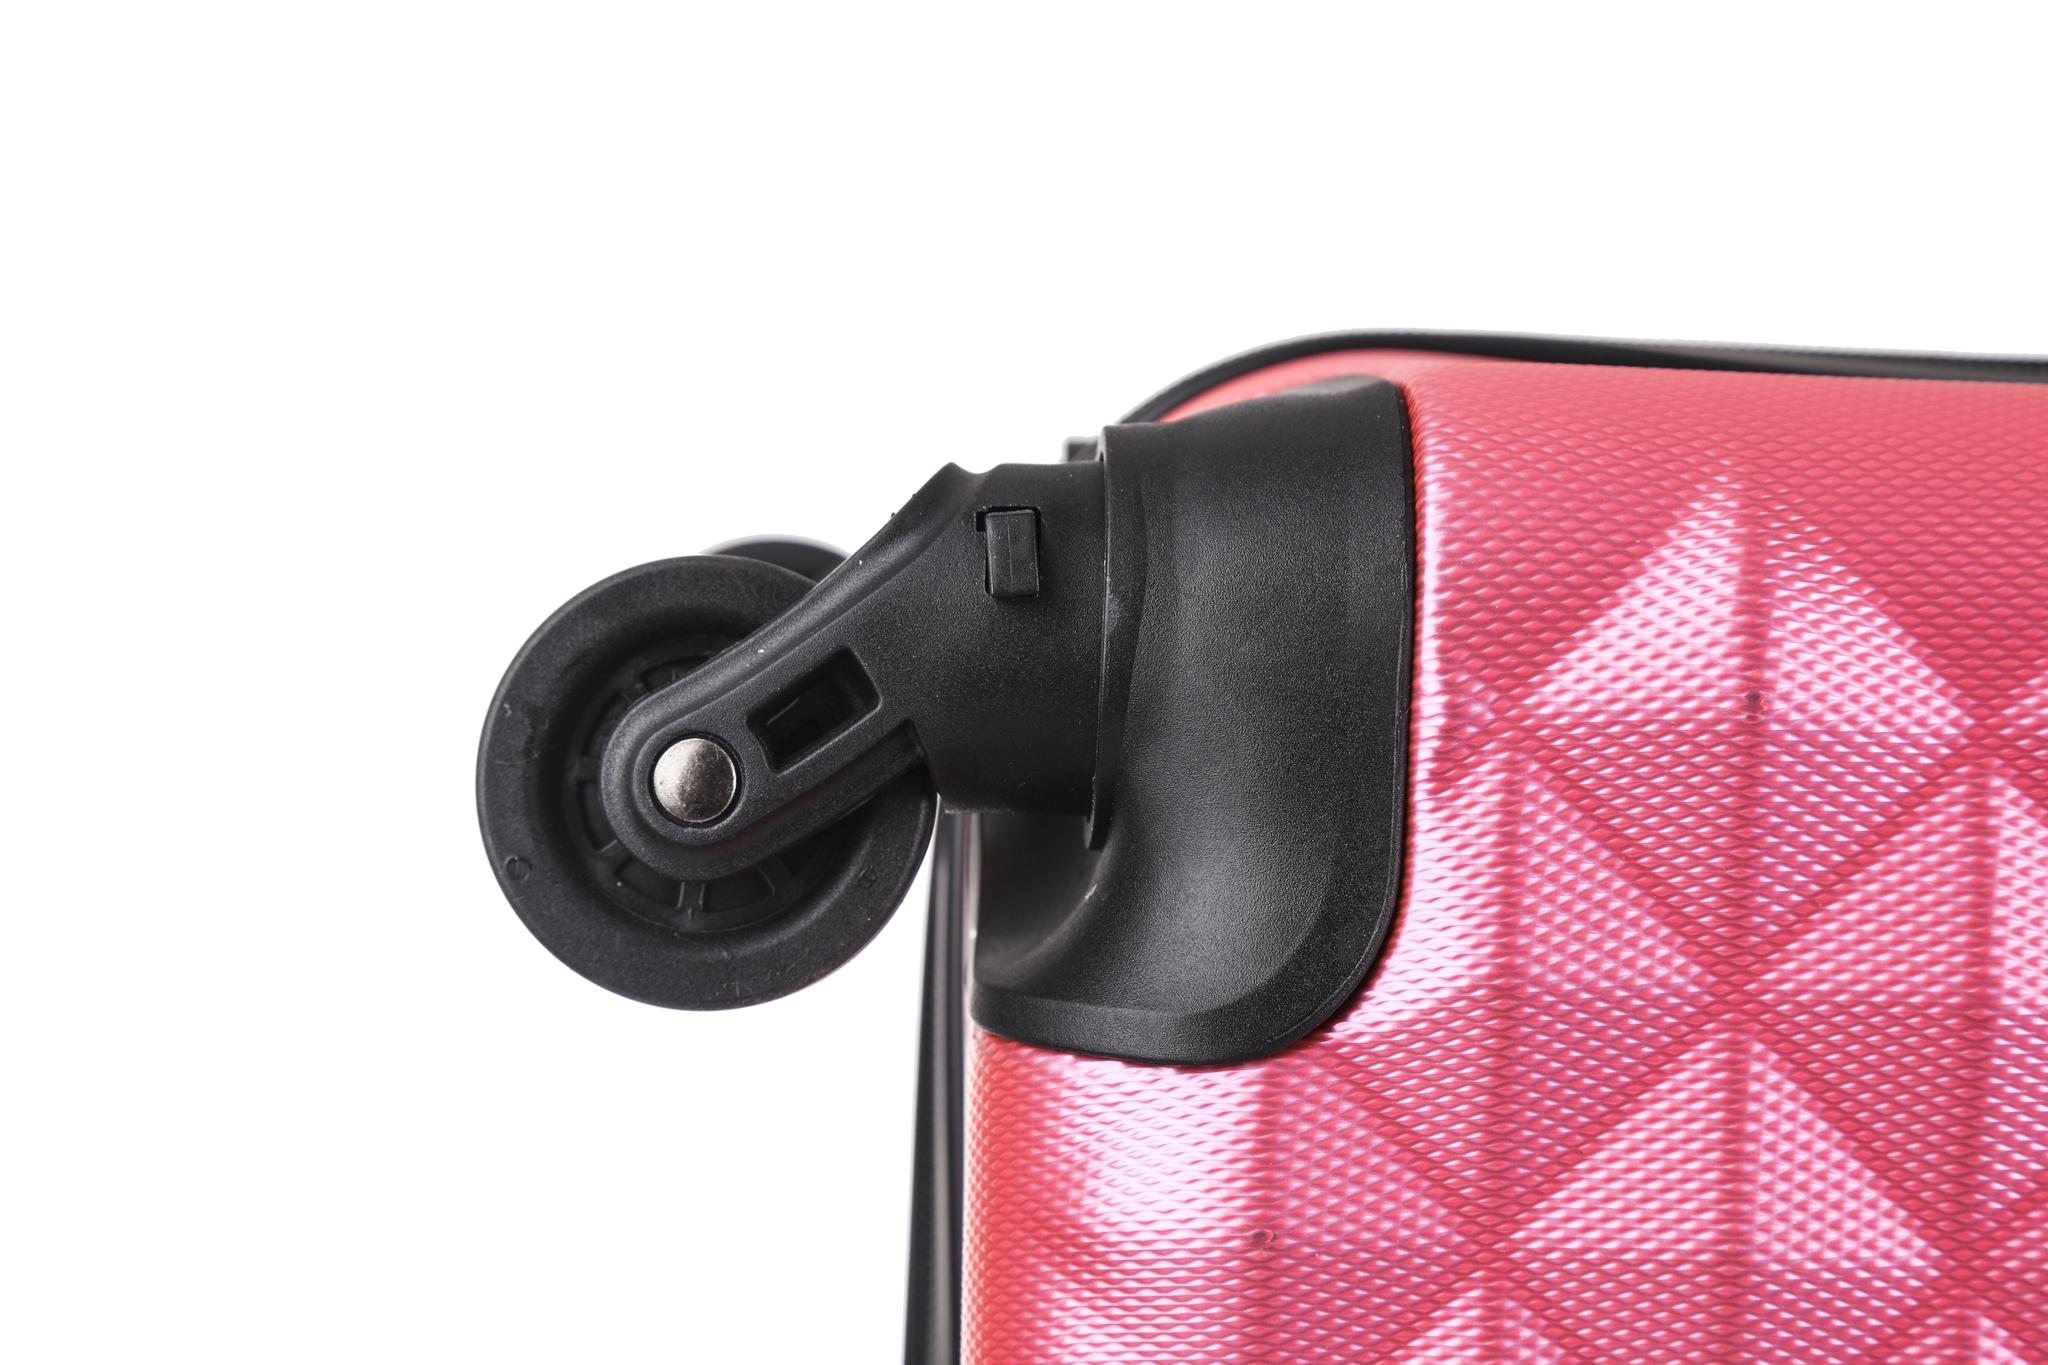 Чемодан со съемными колесами L'case Phatthaya-20 Розовый ручная кладь (S)